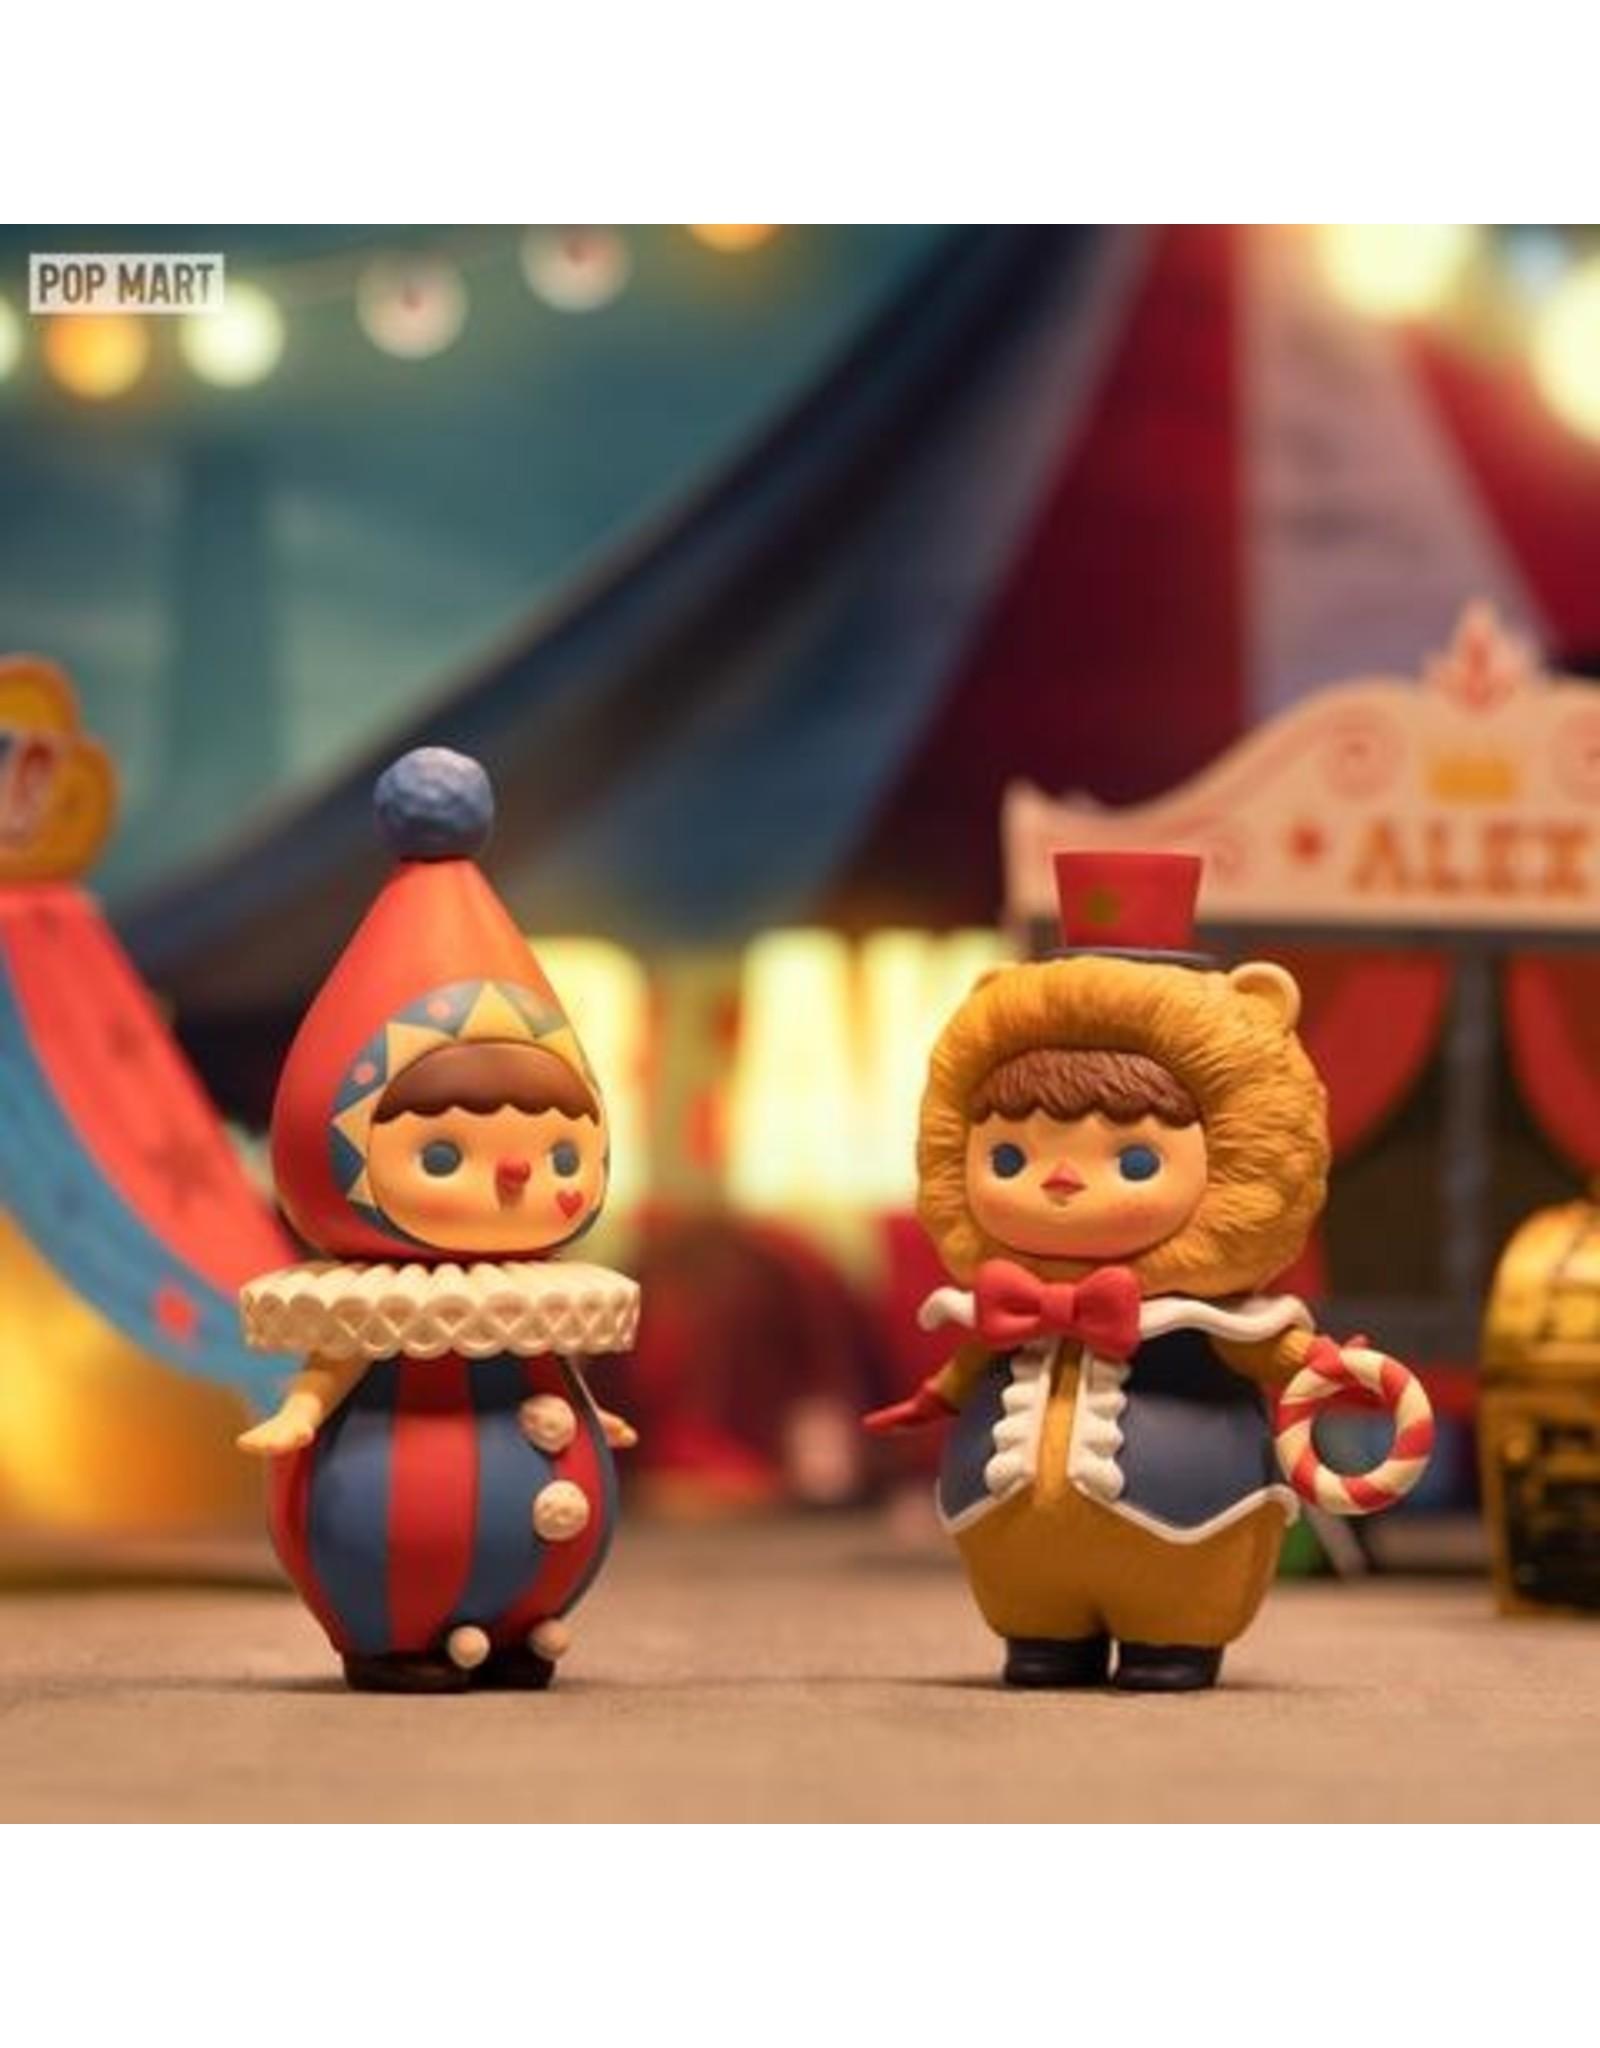 Pop Mart Pucky - Circus Babies - Blind Box